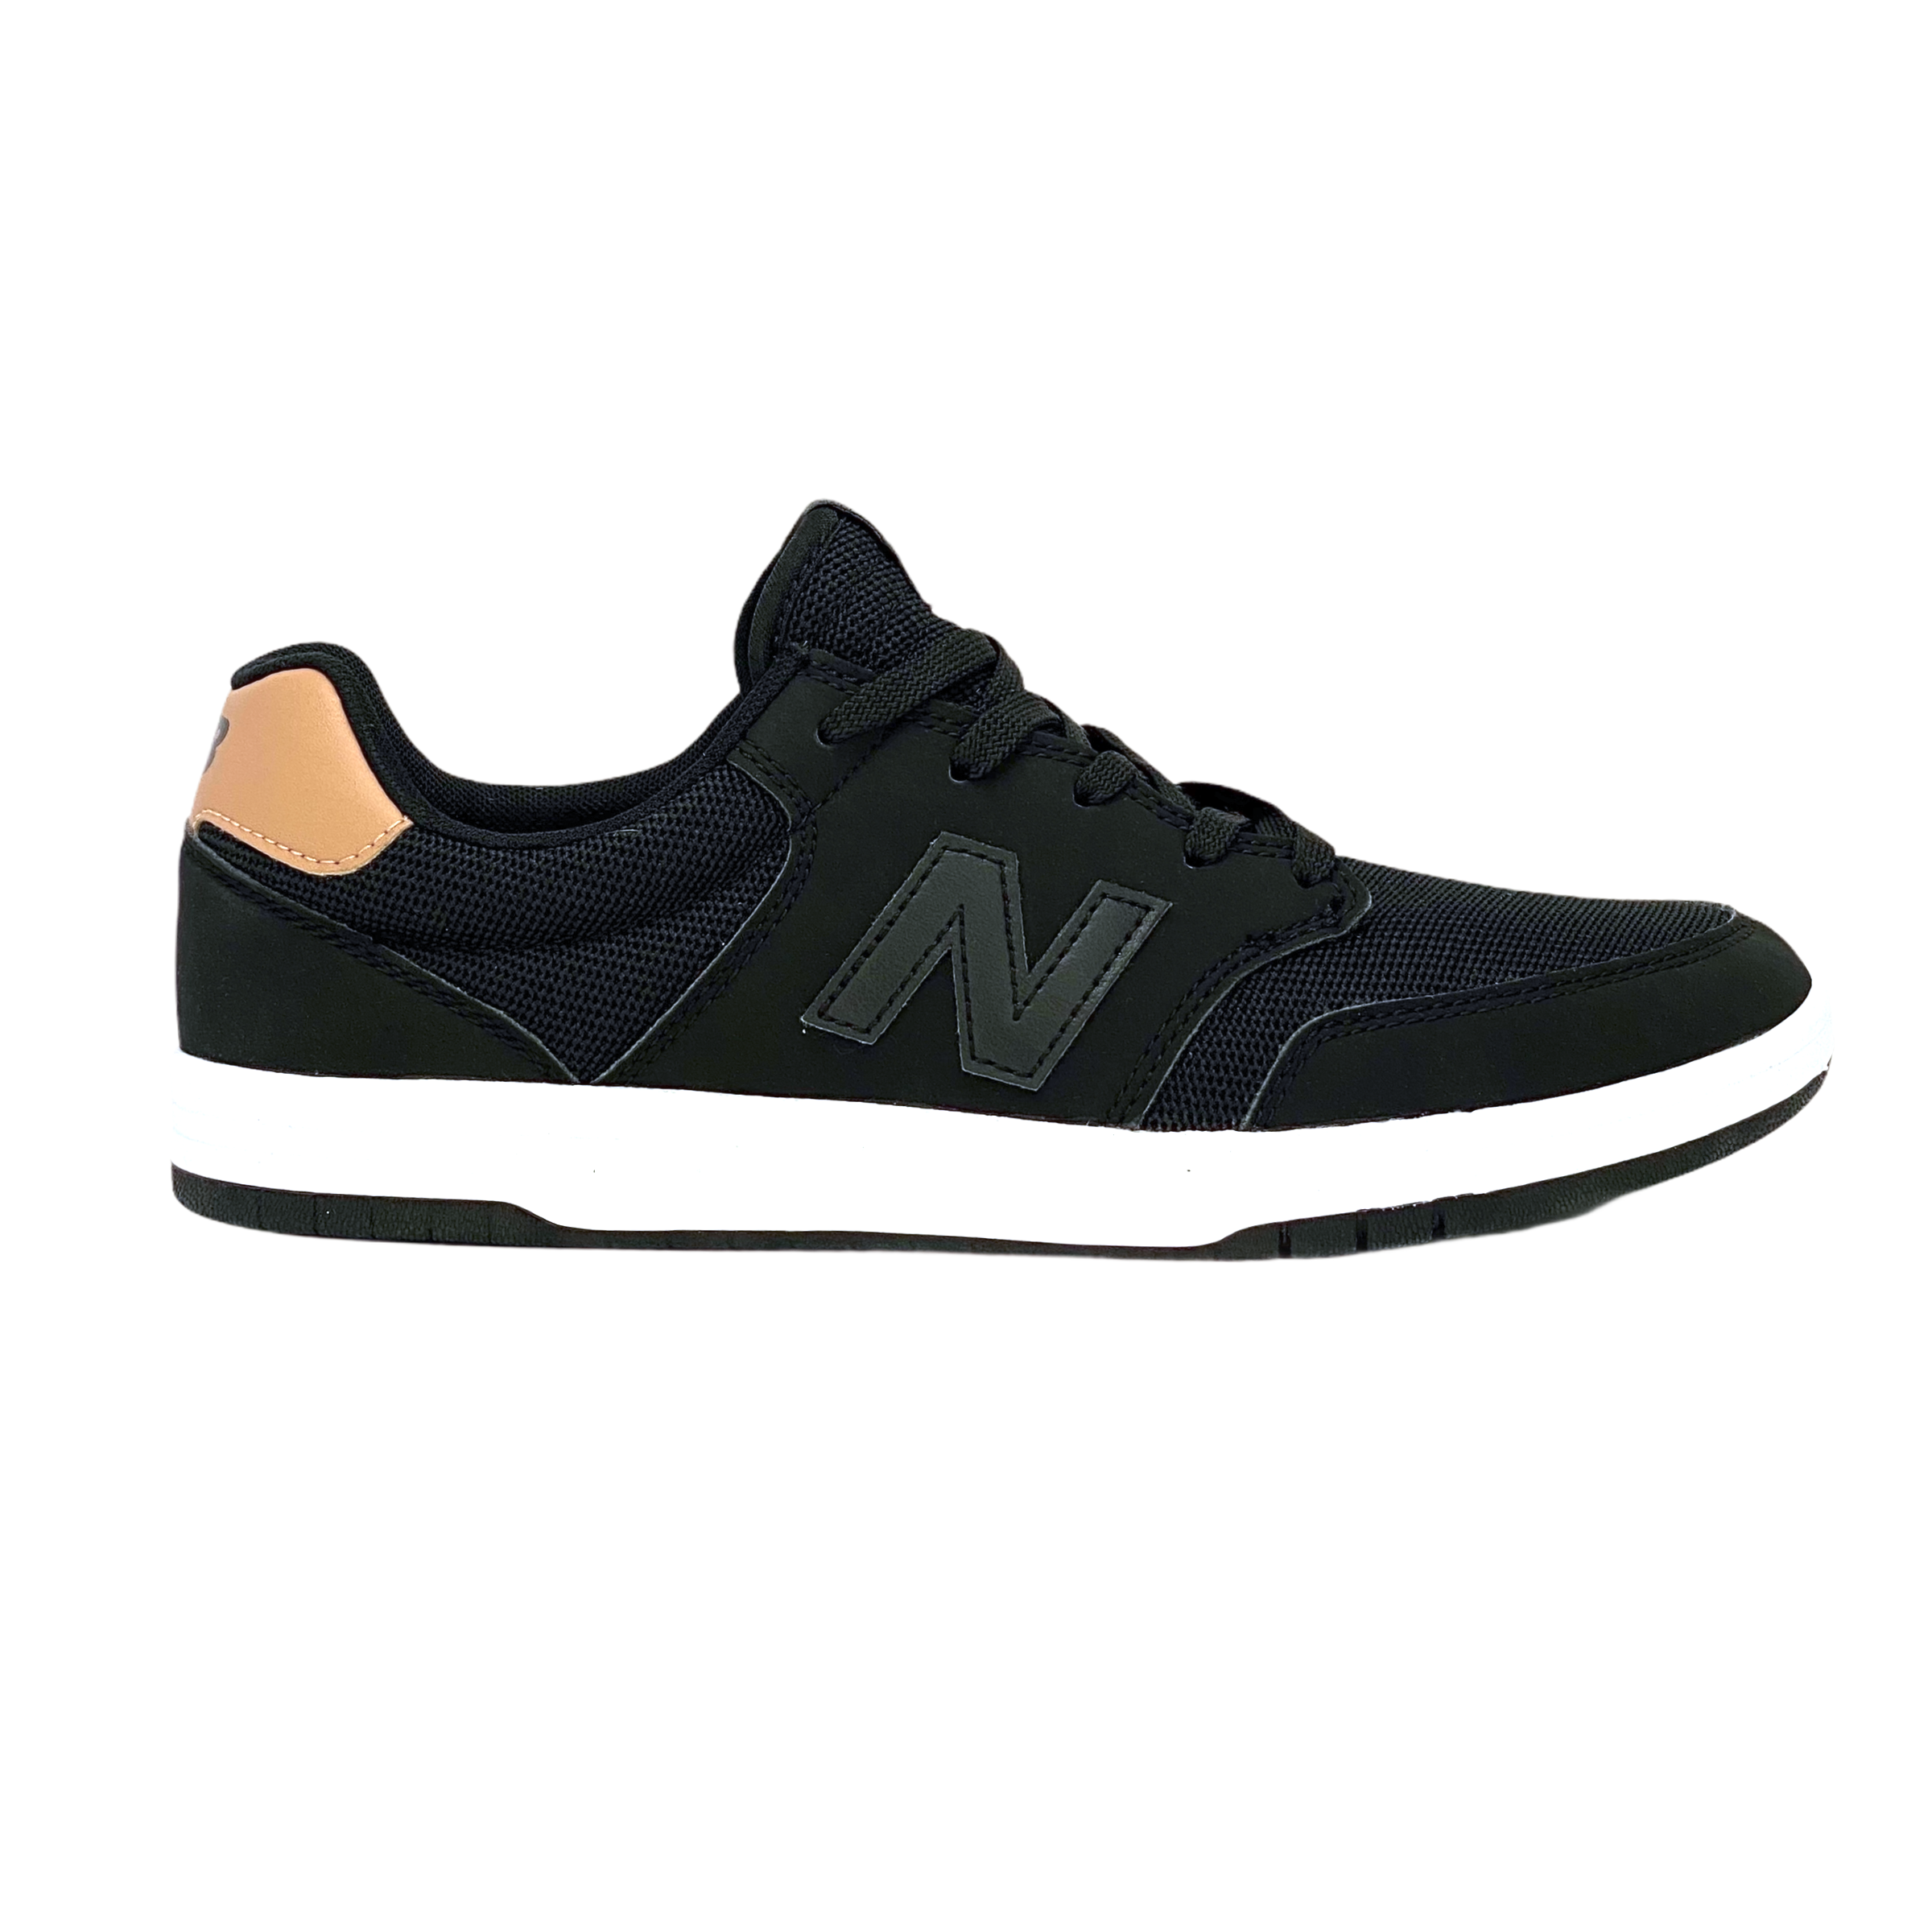 New Balance - ALL COASTS AM 425 Nero